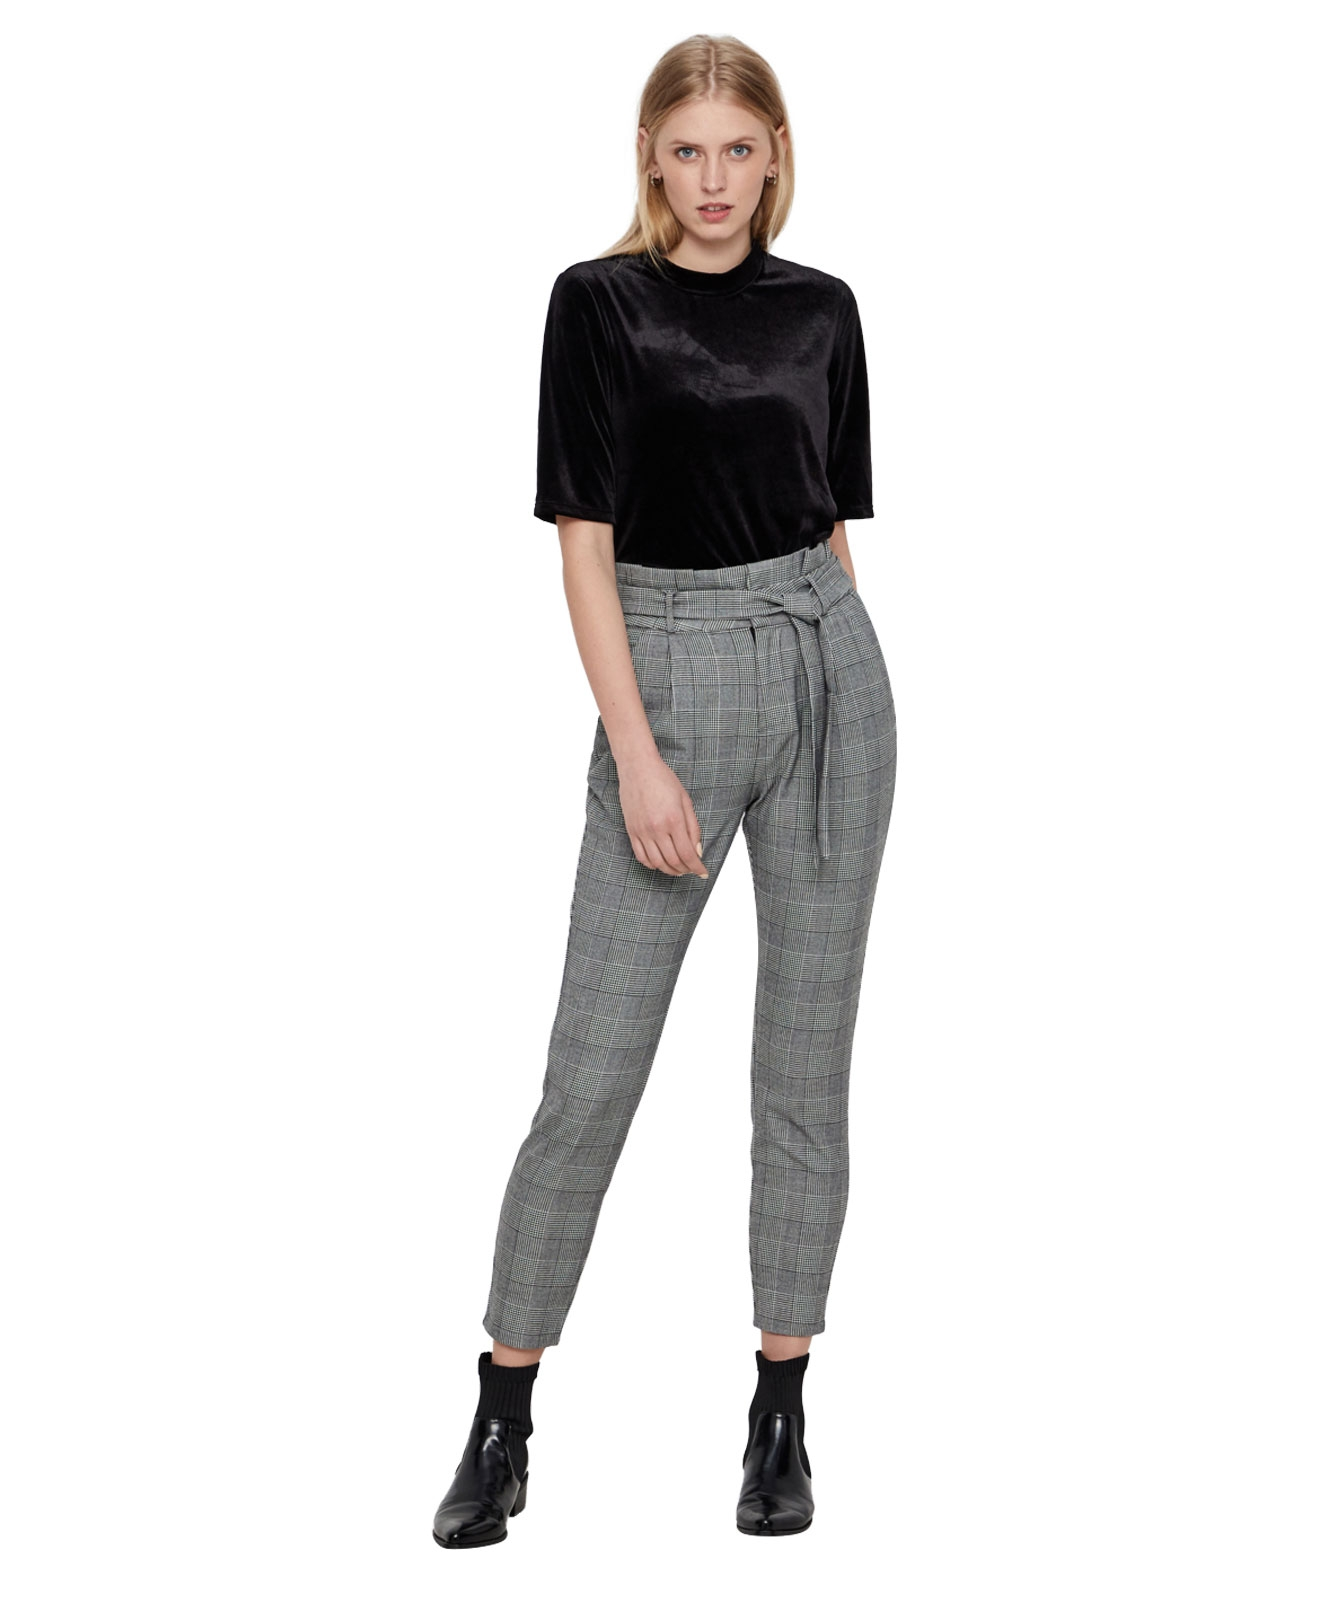 Hosen - Vero Moda High Waist Paperback Hose EVA im Karo Look  - Onlineshop Jeans Meile